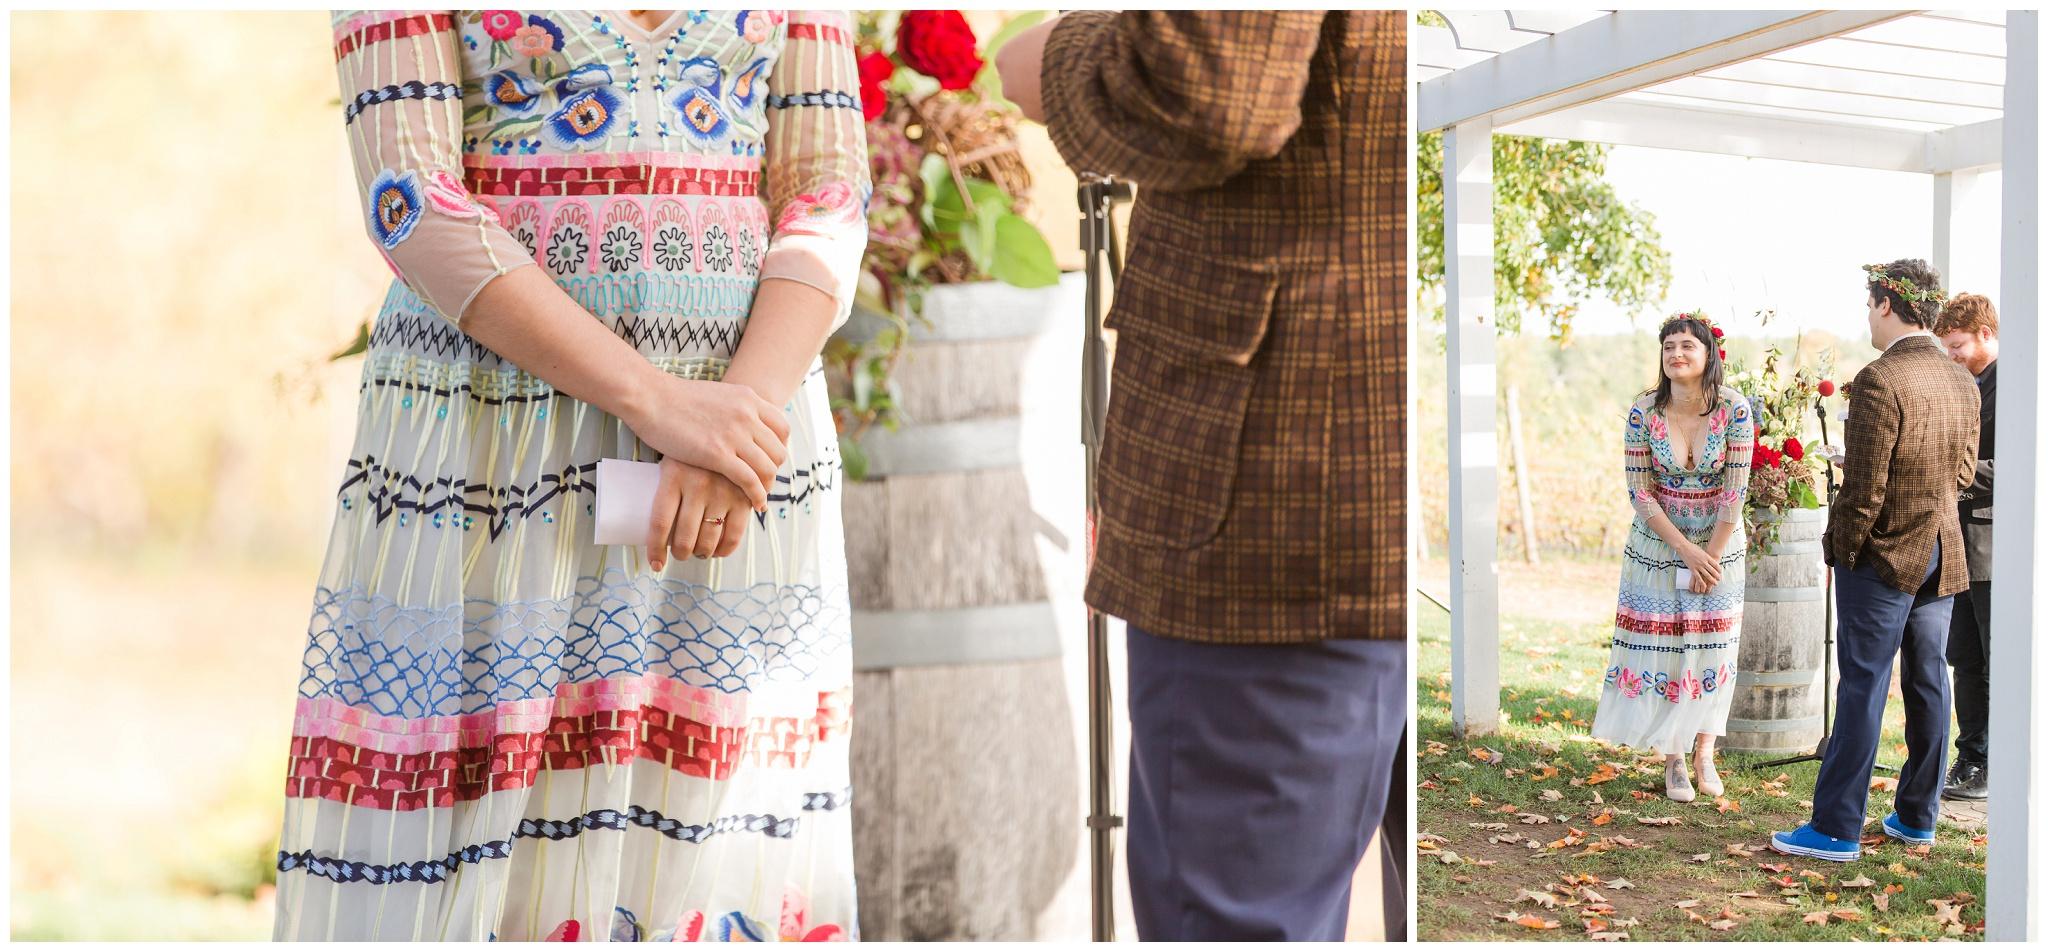 Lee-new-hampshire-wedding-flag-hill-winery-alternative-wedding-dress